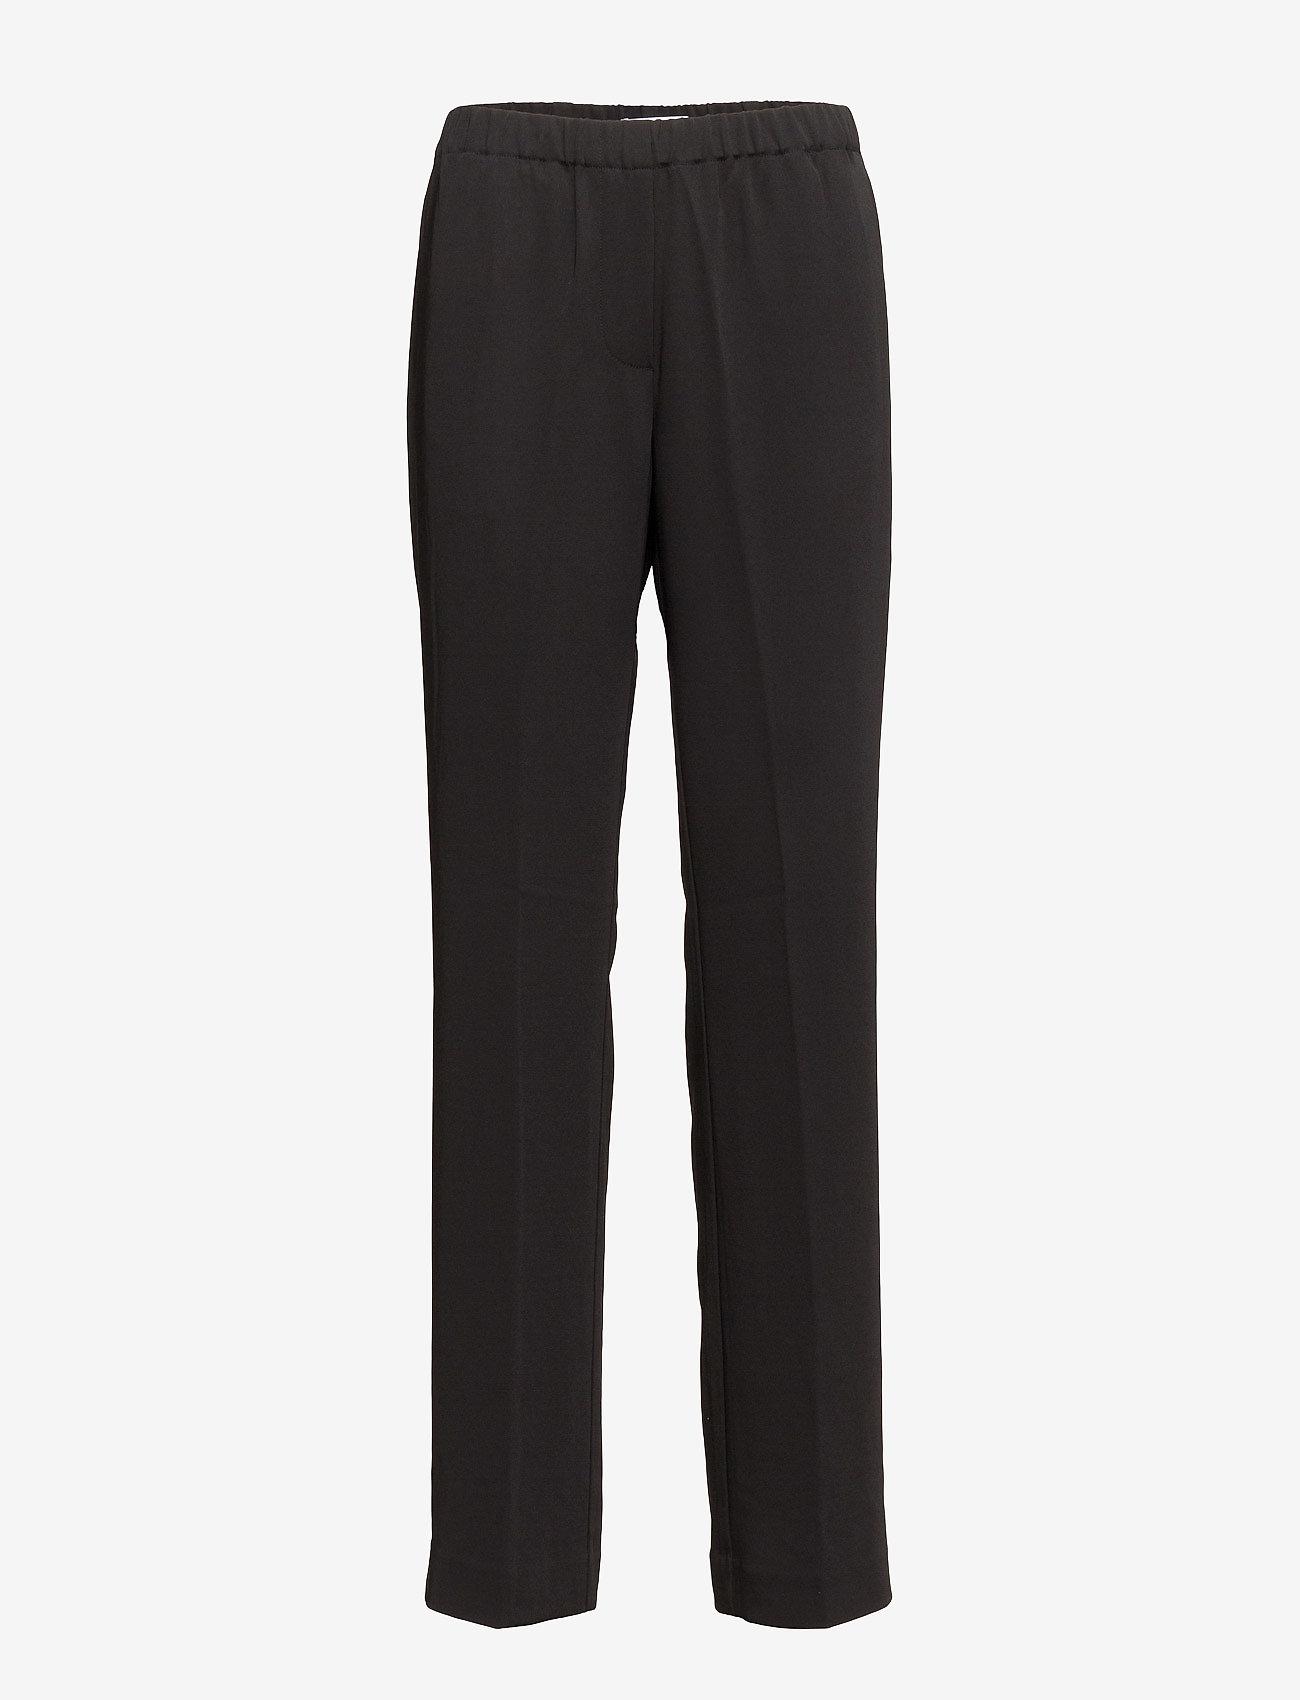 Samsøe Samsøe - Hoys straight pants 7331 - bukser med lige ben - black - 0